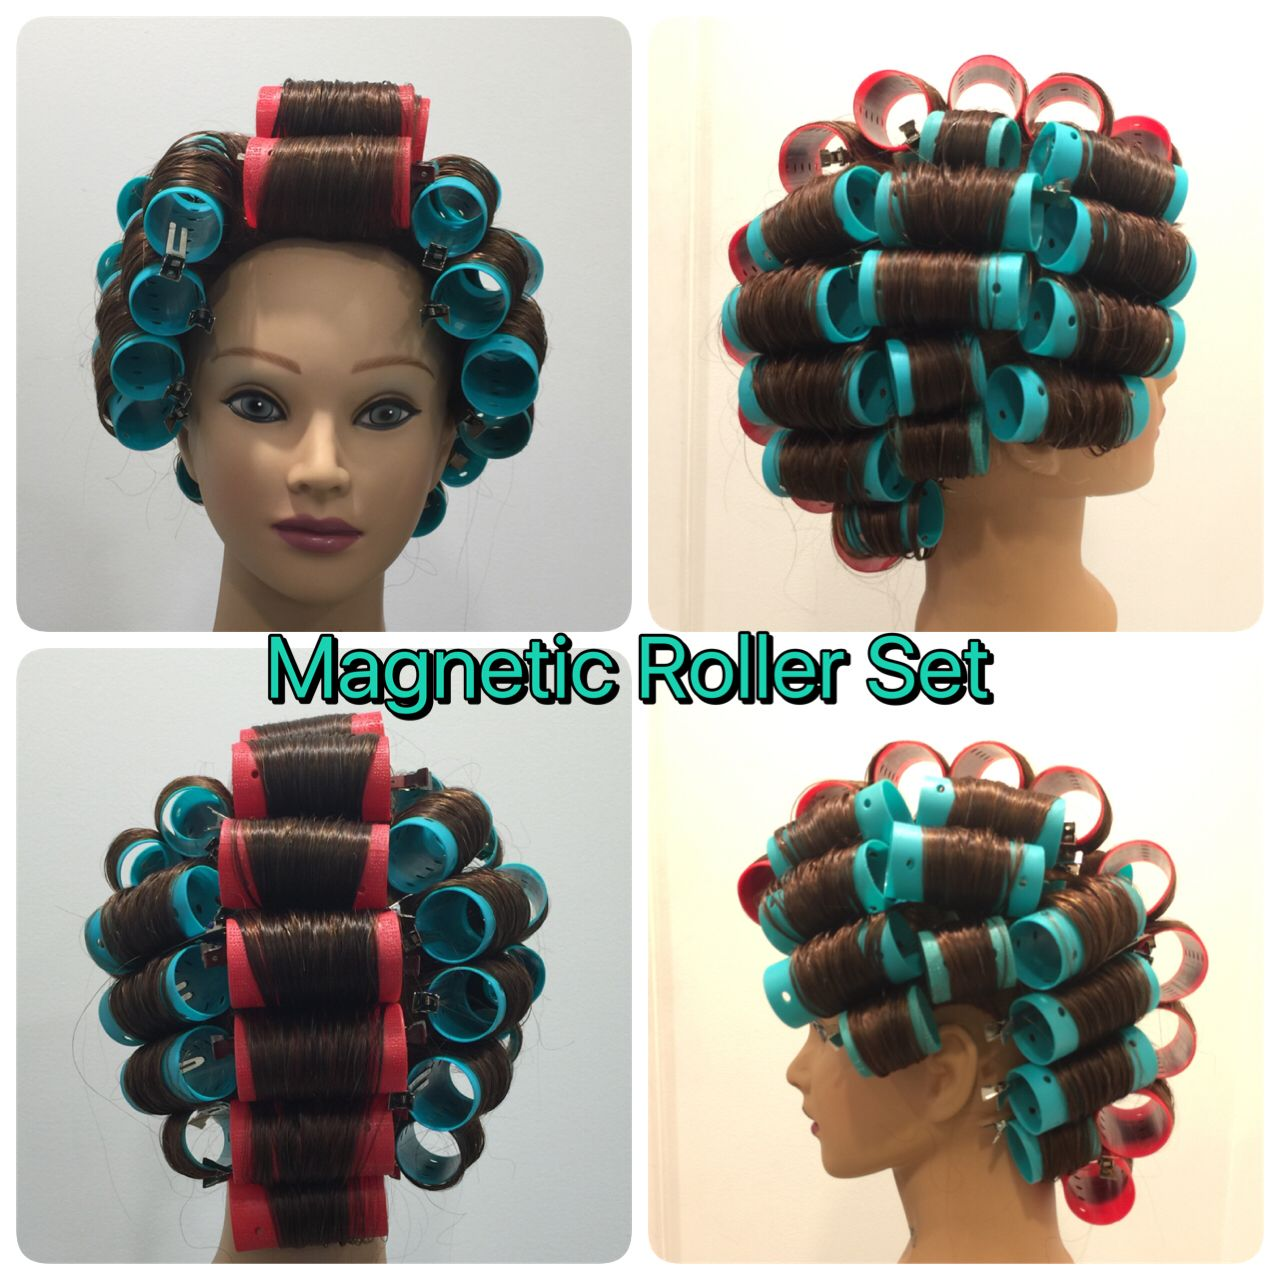 Magnetic Roller Set Roller Set Natural Hair Hair Rollers Natural Hair Styles